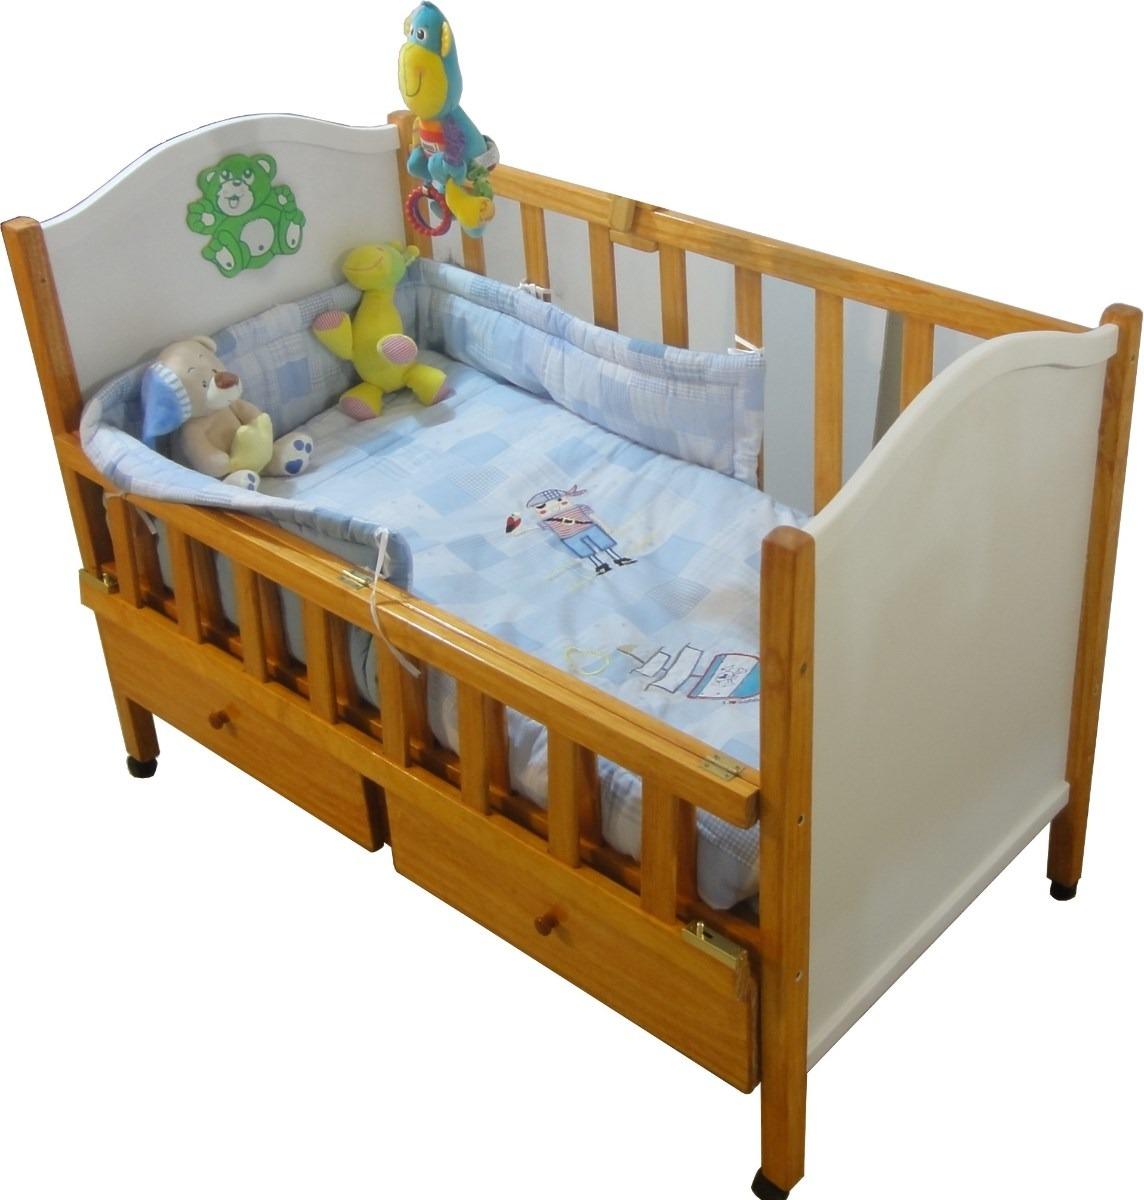 Cuna imagui - Cunas y muebles para bebes ...